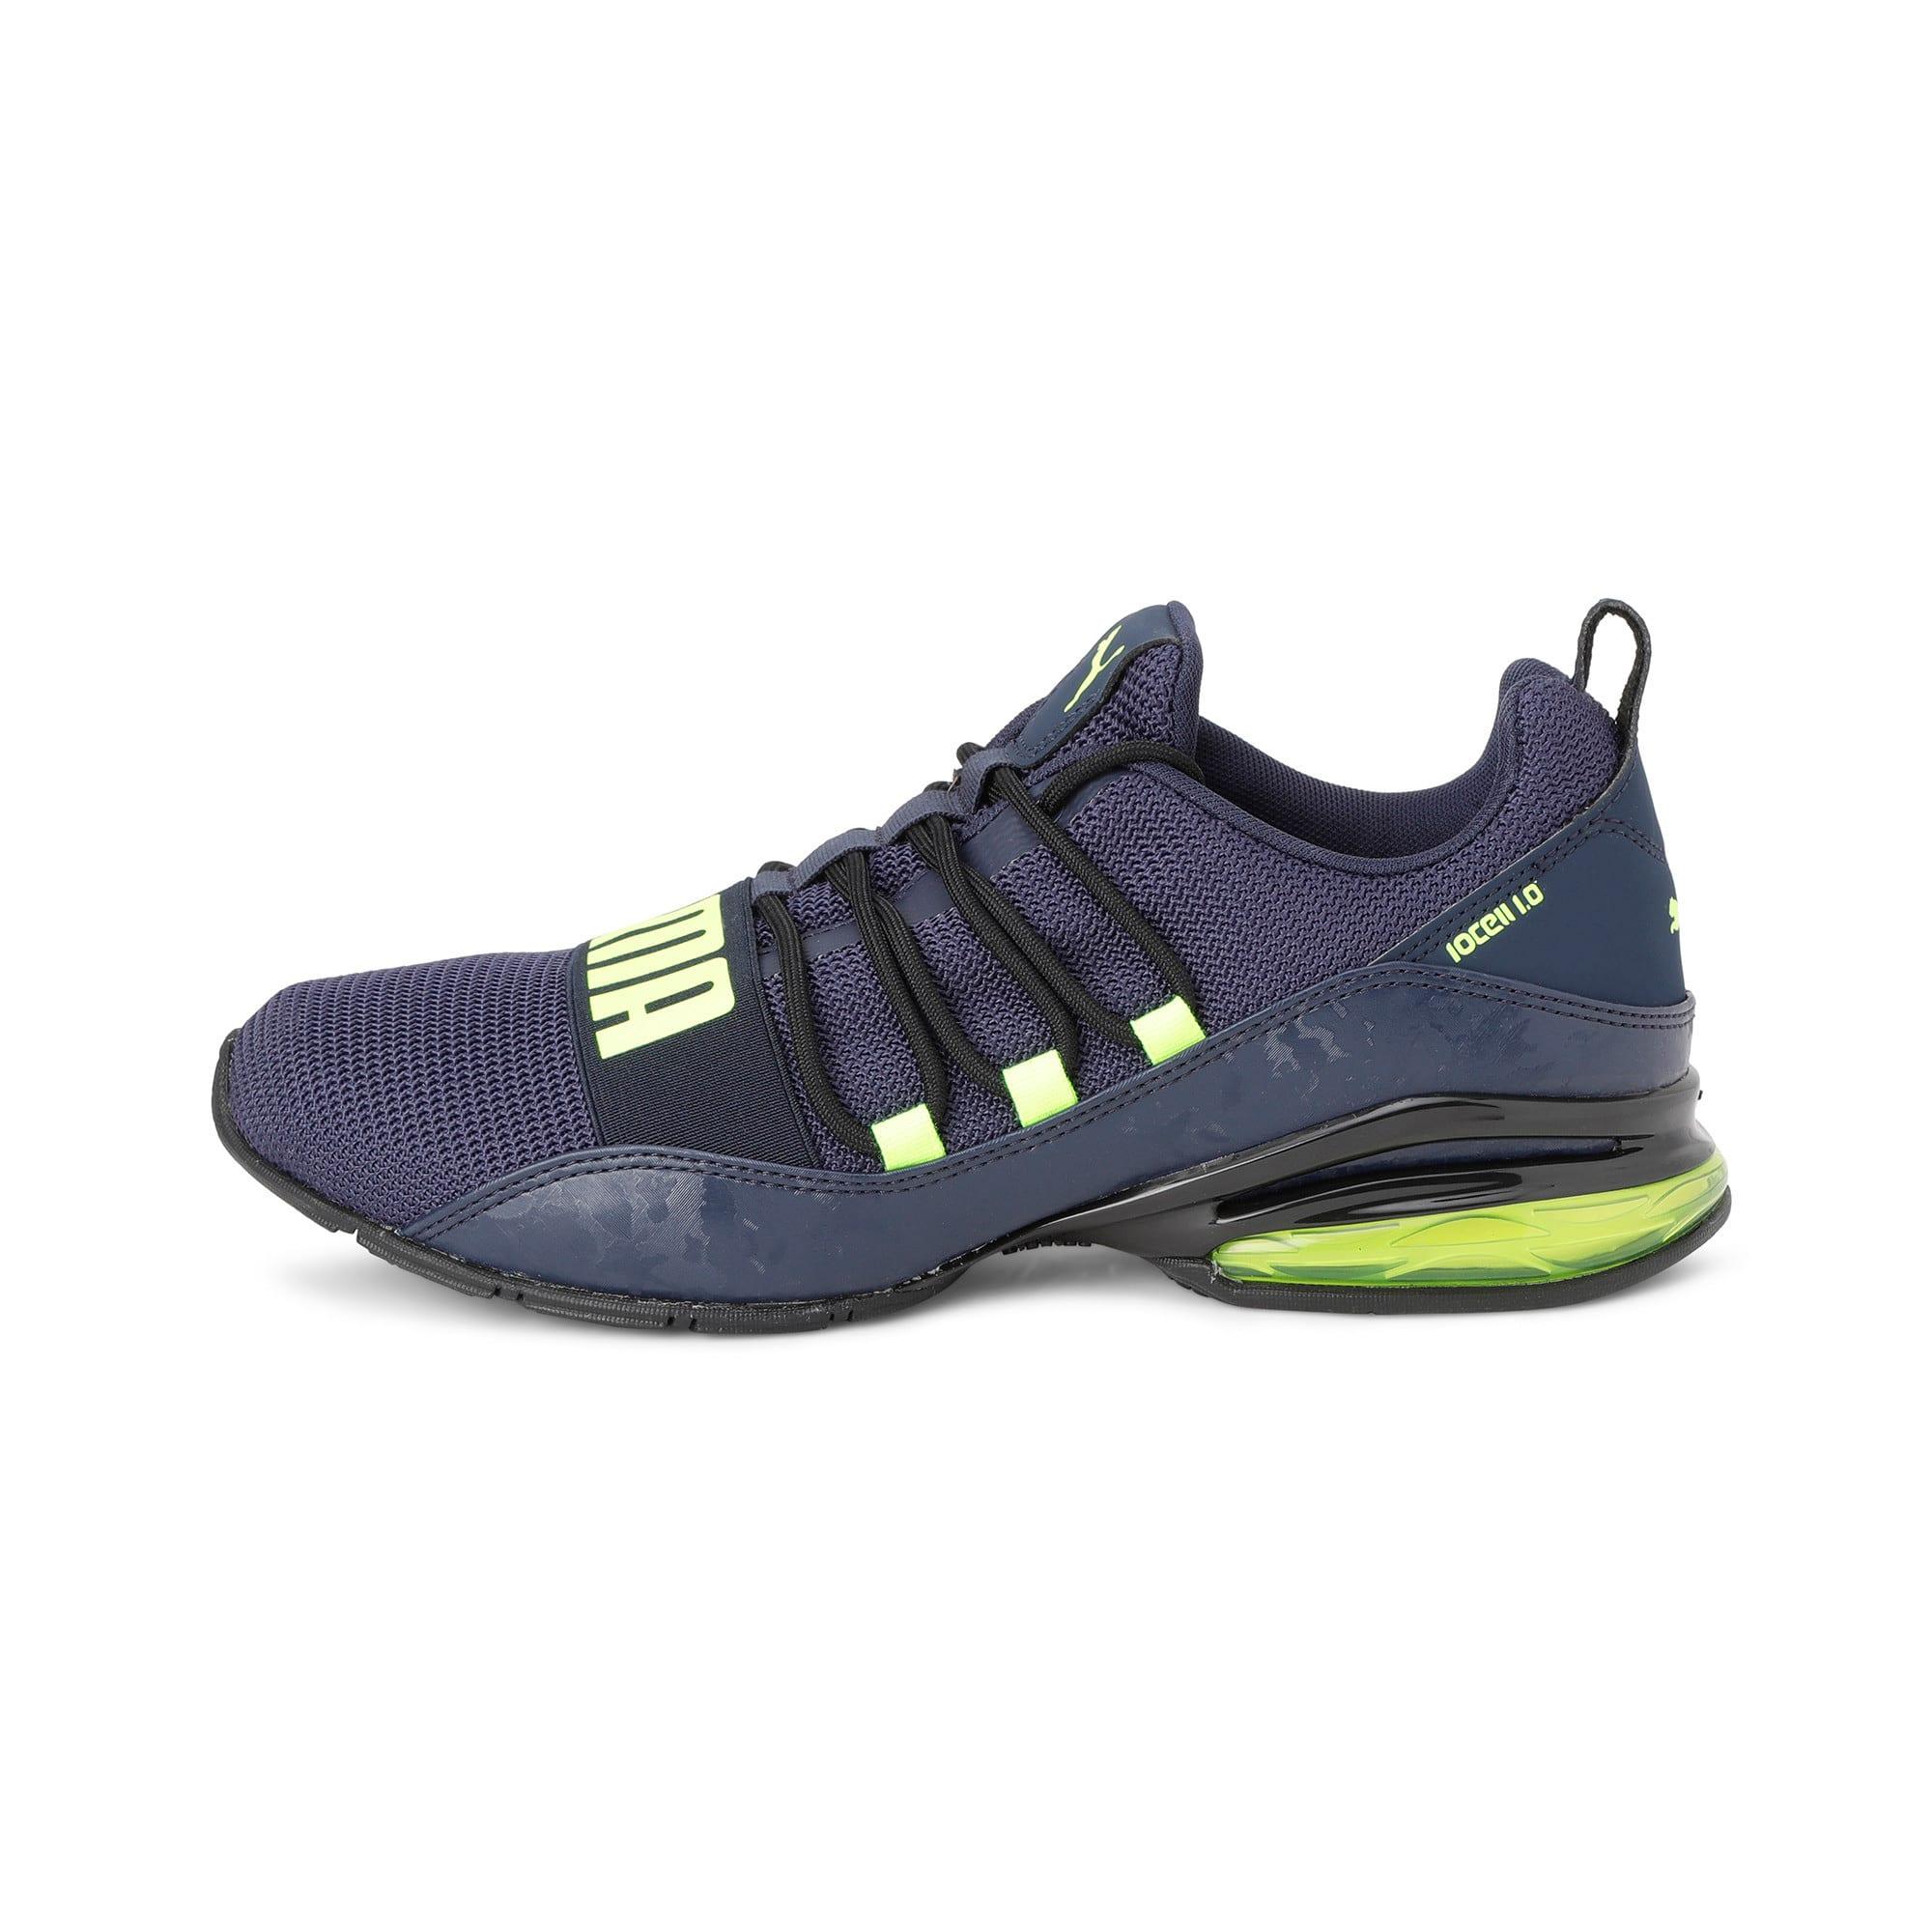 Thumbnail 1 of Cell Regulate Camo Men's Running Shoes, Peacoat-Yellow Alert, medium-IND